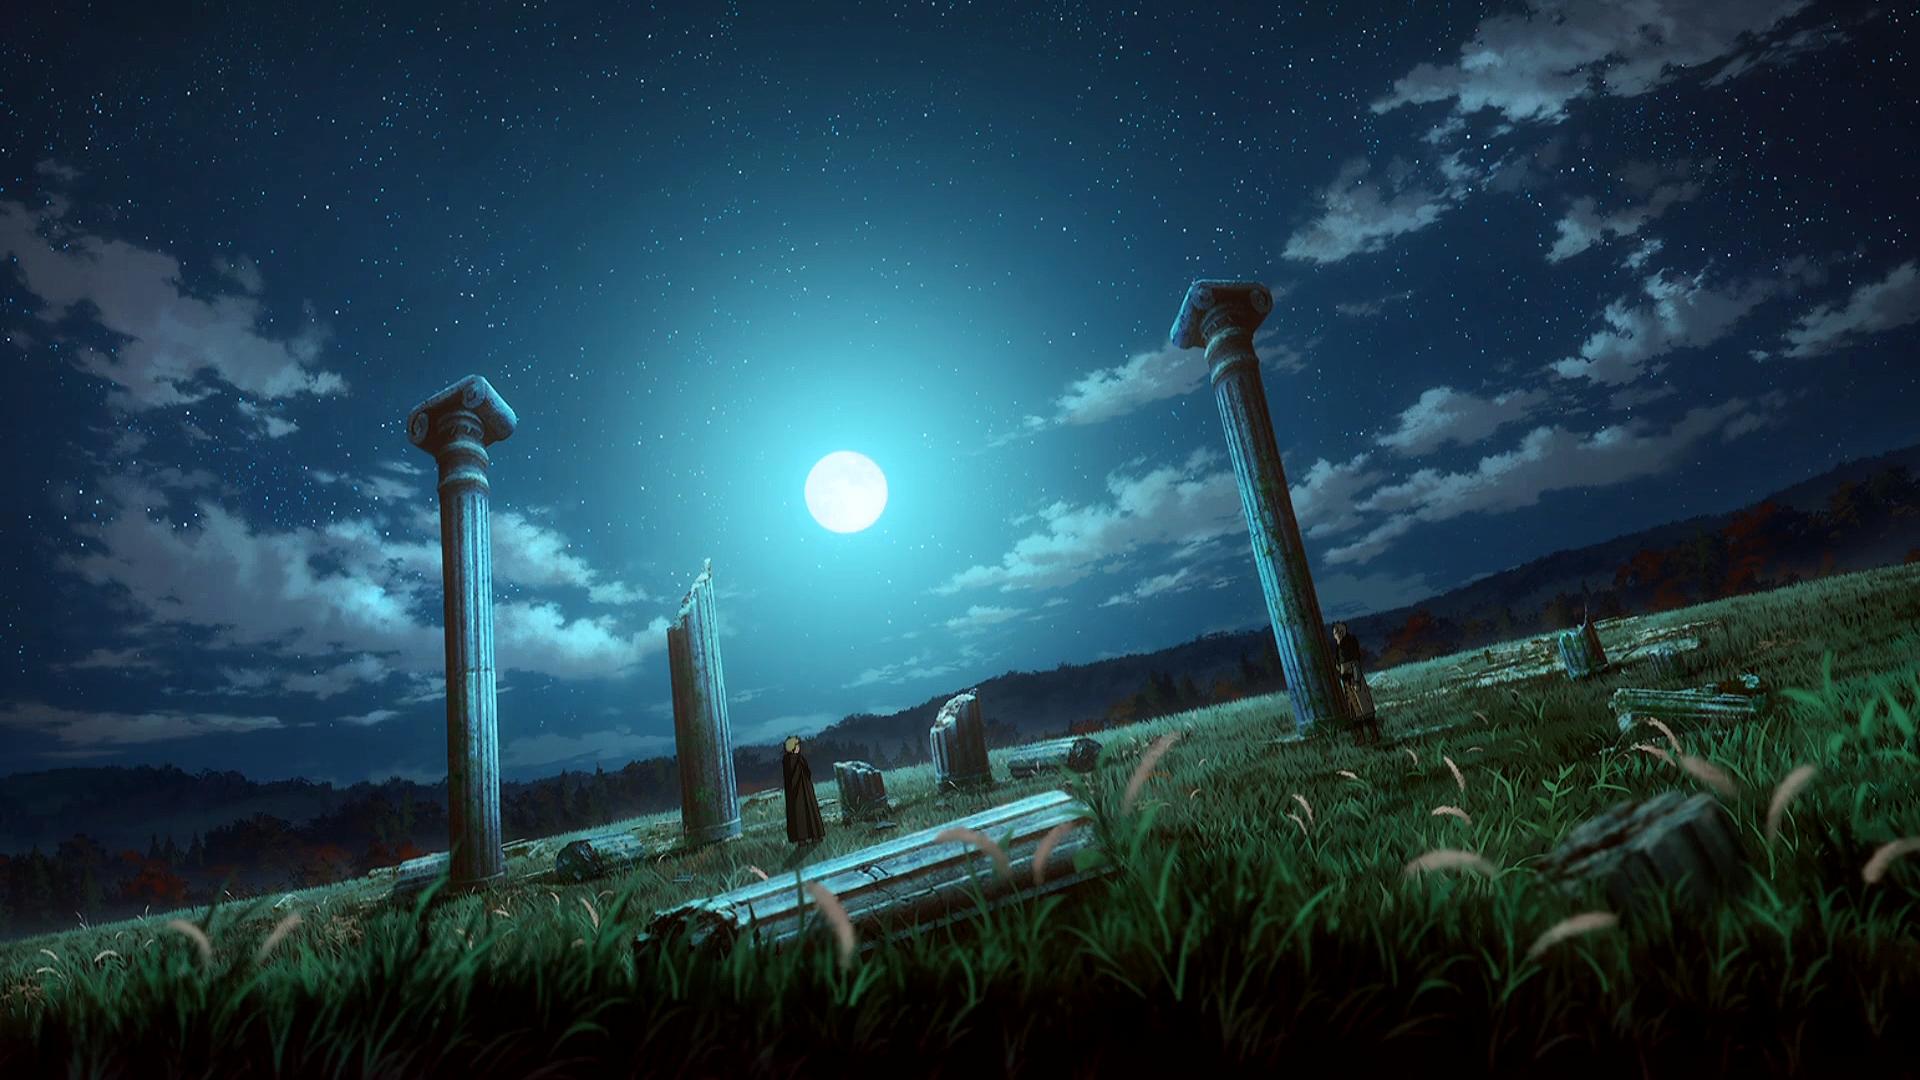 Anime 1920x1080 Vinland Saga landscape ruins night night sky Moon stars clouds roman empire England anime manga trees grass Makoto Yukimura Wit Studio Thorfinn Vikings yellow hair Askeladd cloaks standing